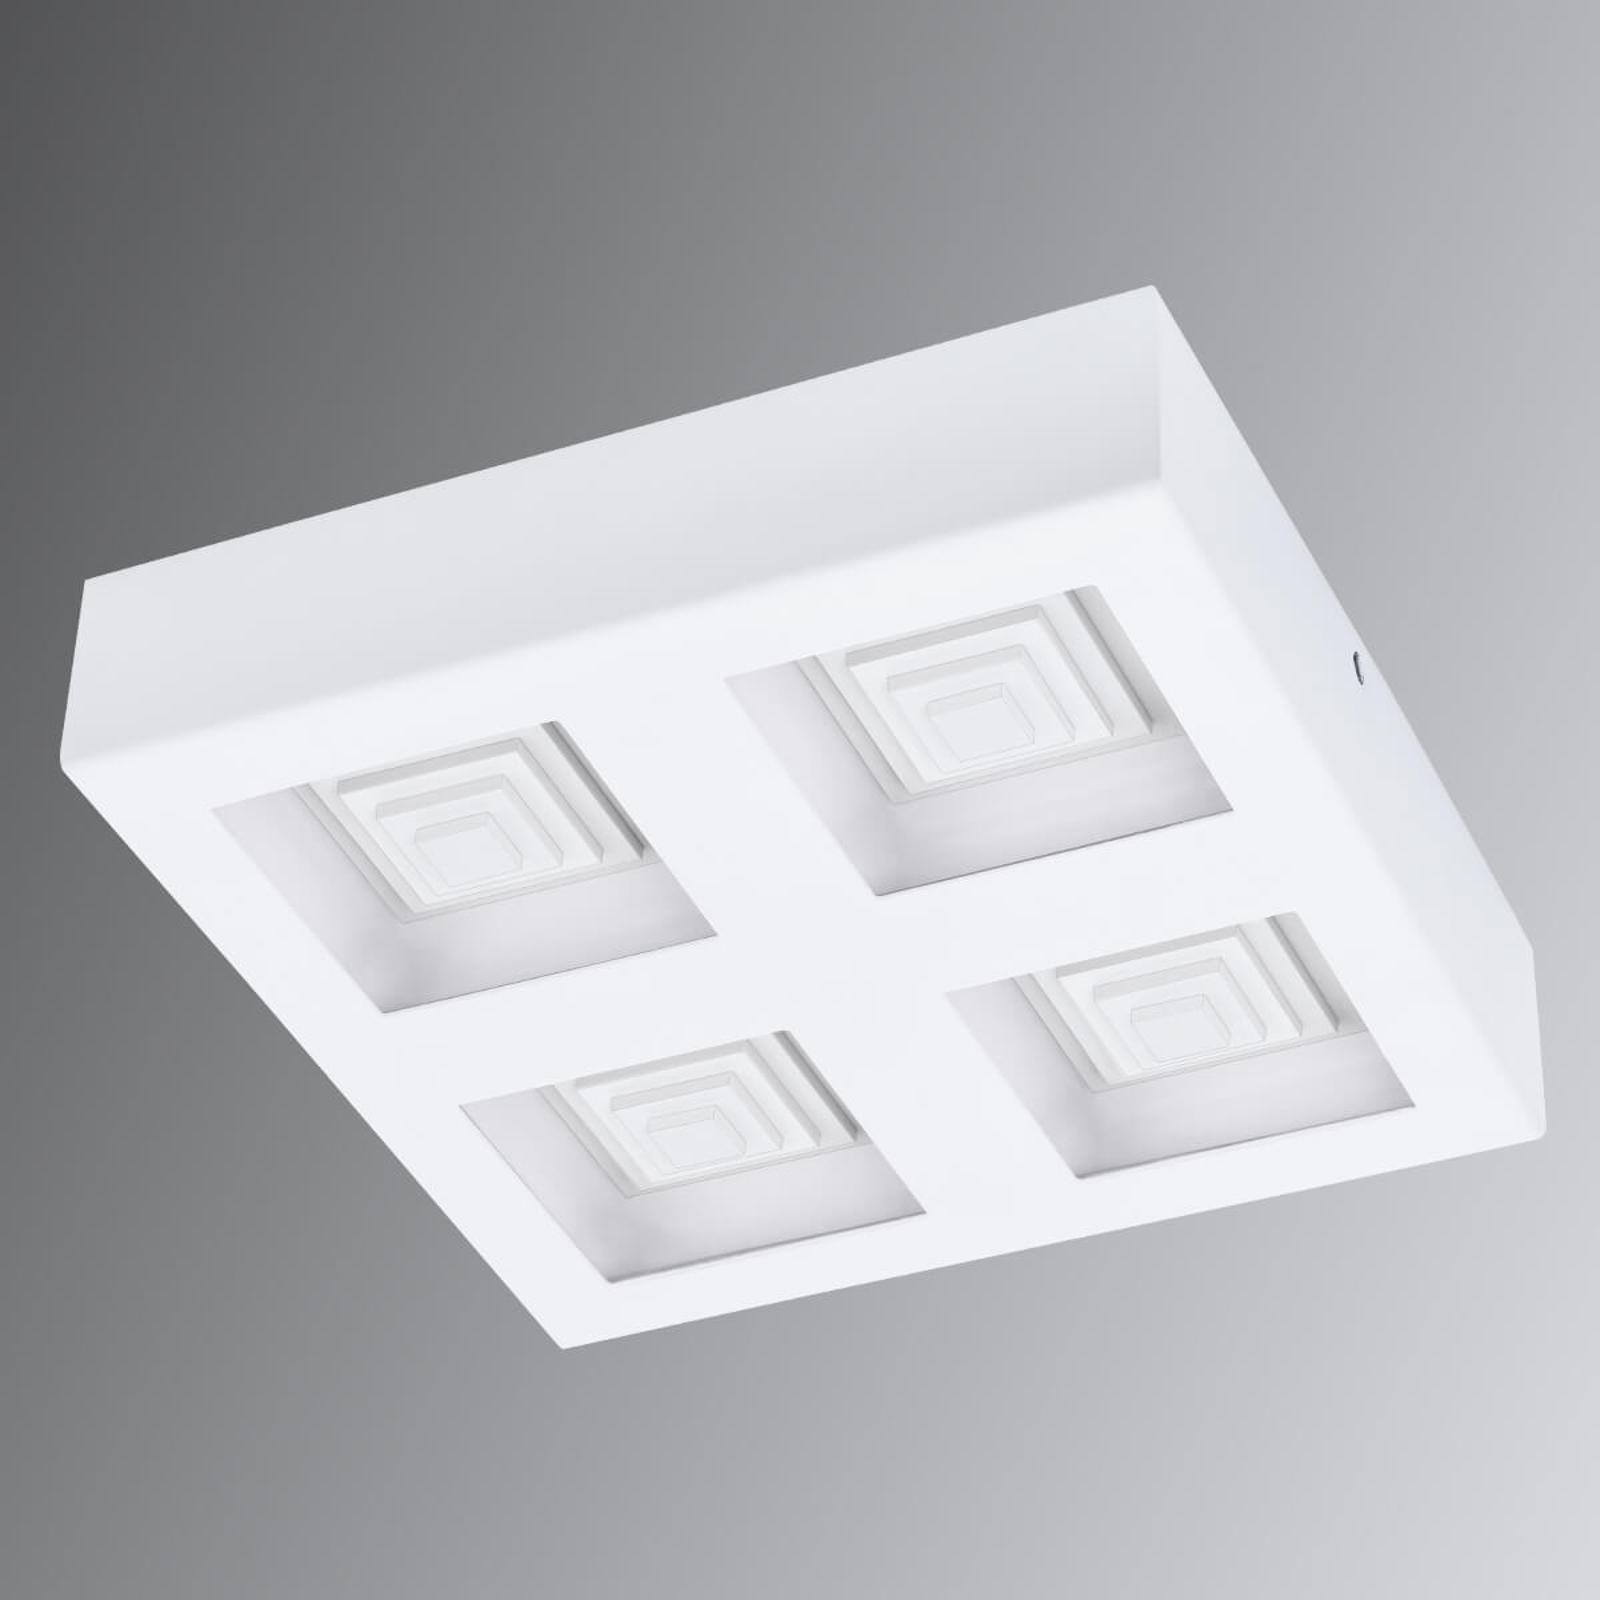 LED plafondlamp Ferreros, 4-lamps